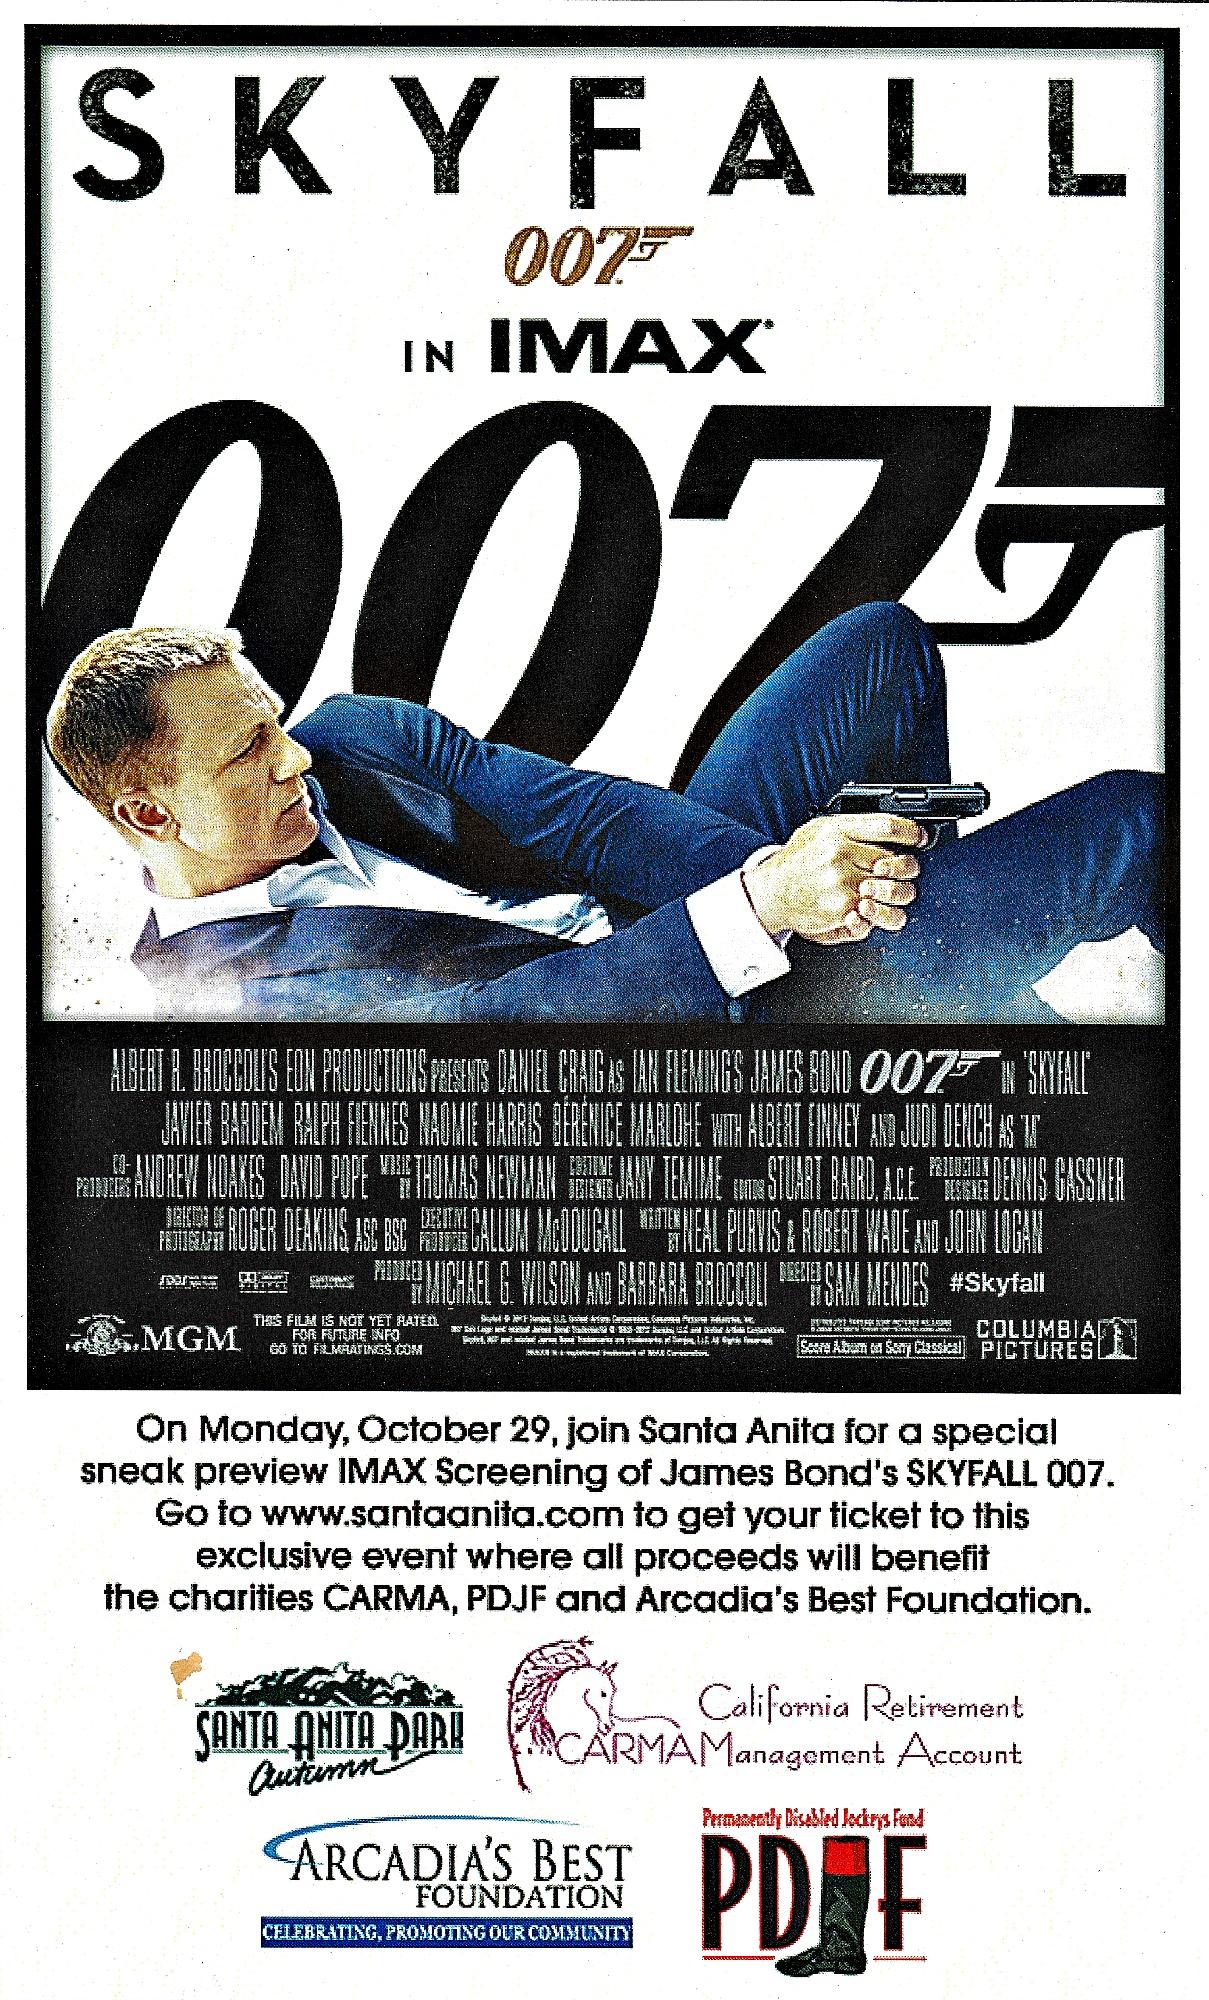 James Bond 007 movies guide – Hollywood in Hi Def